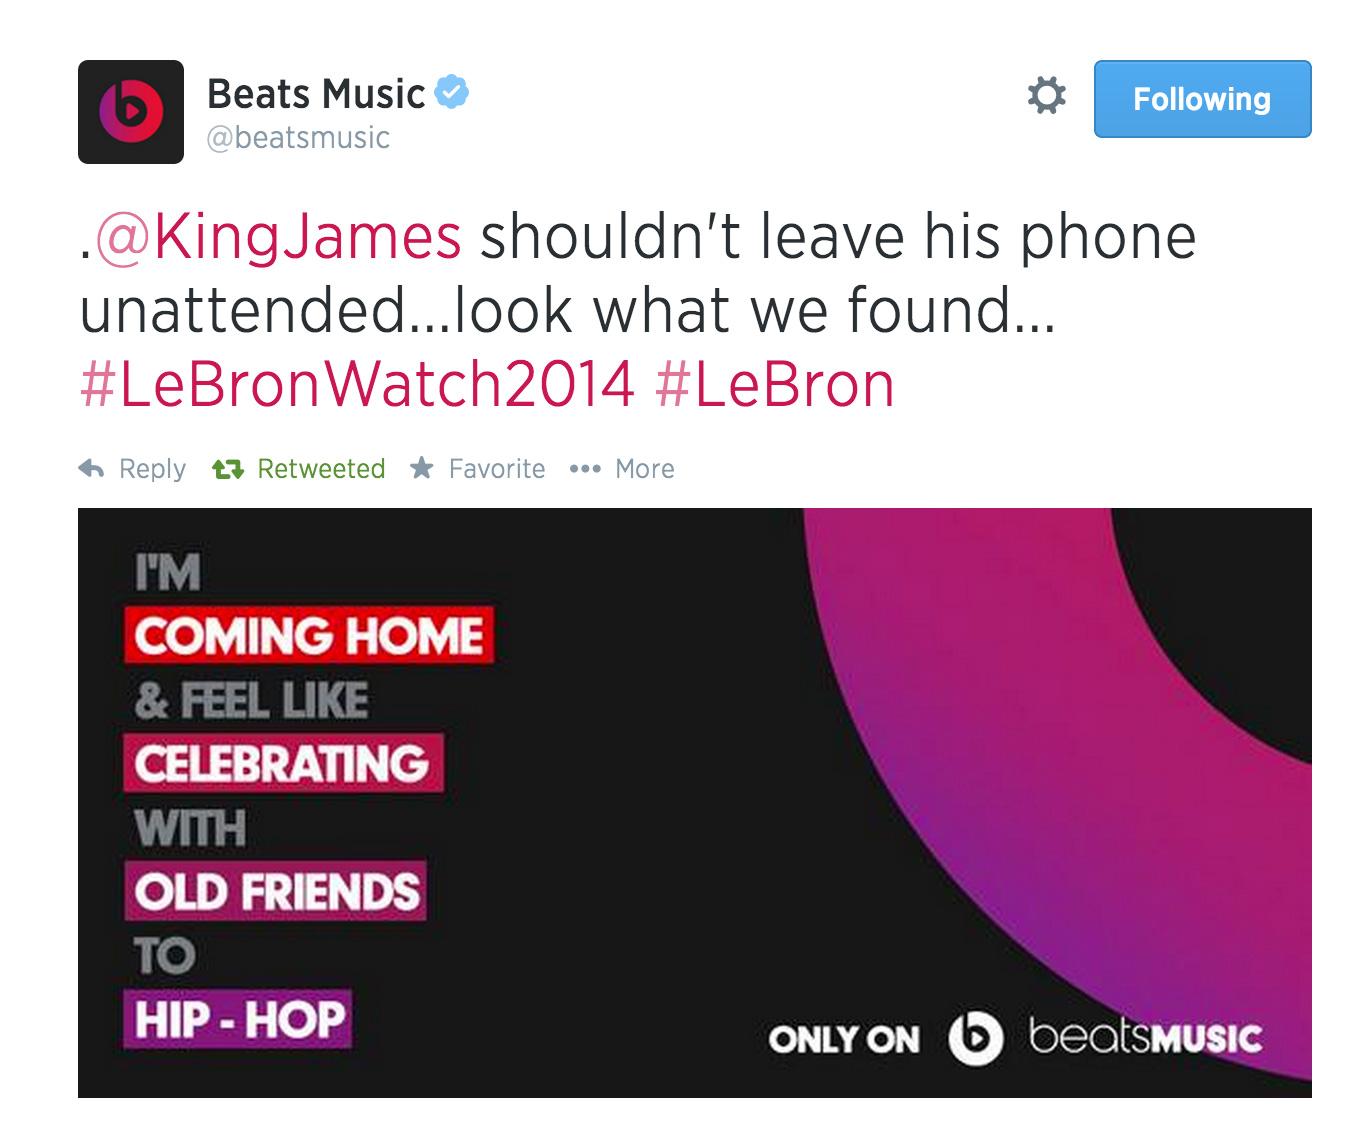 Did Beats' tweet reveal it first?